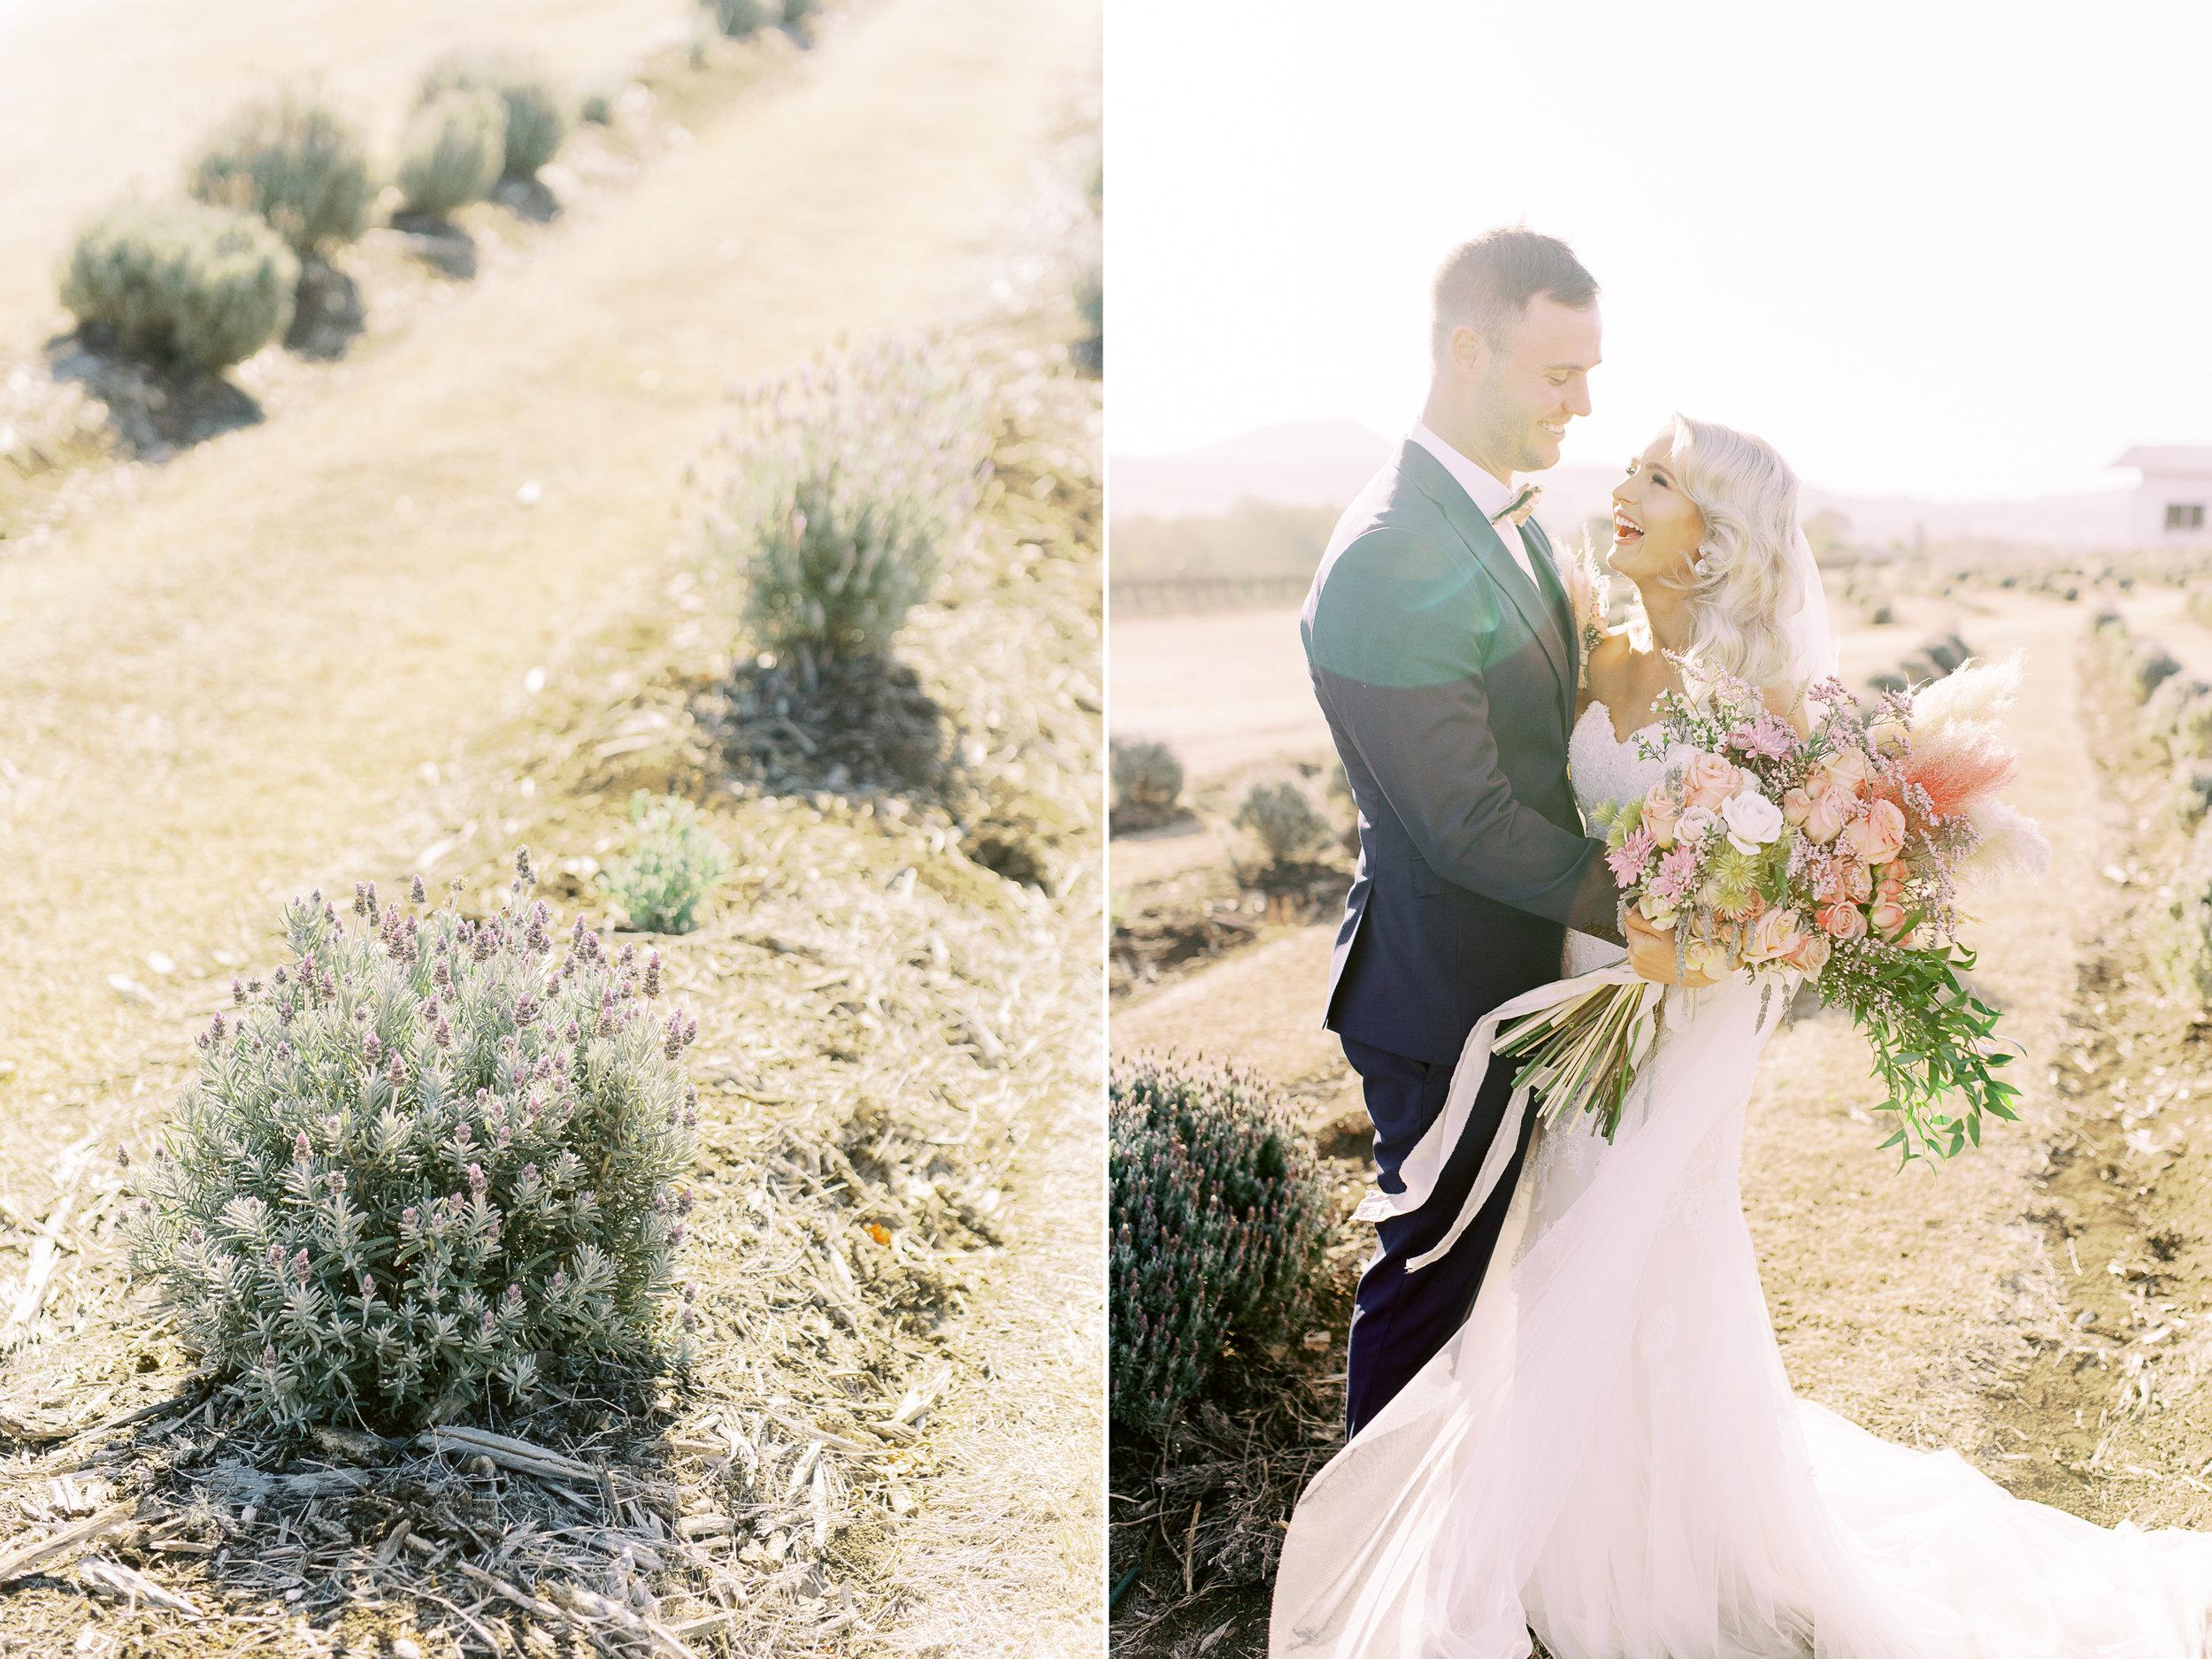 kooroomba-lavendar-farm-film-photography-wedding-photography-romantic-21.jpg